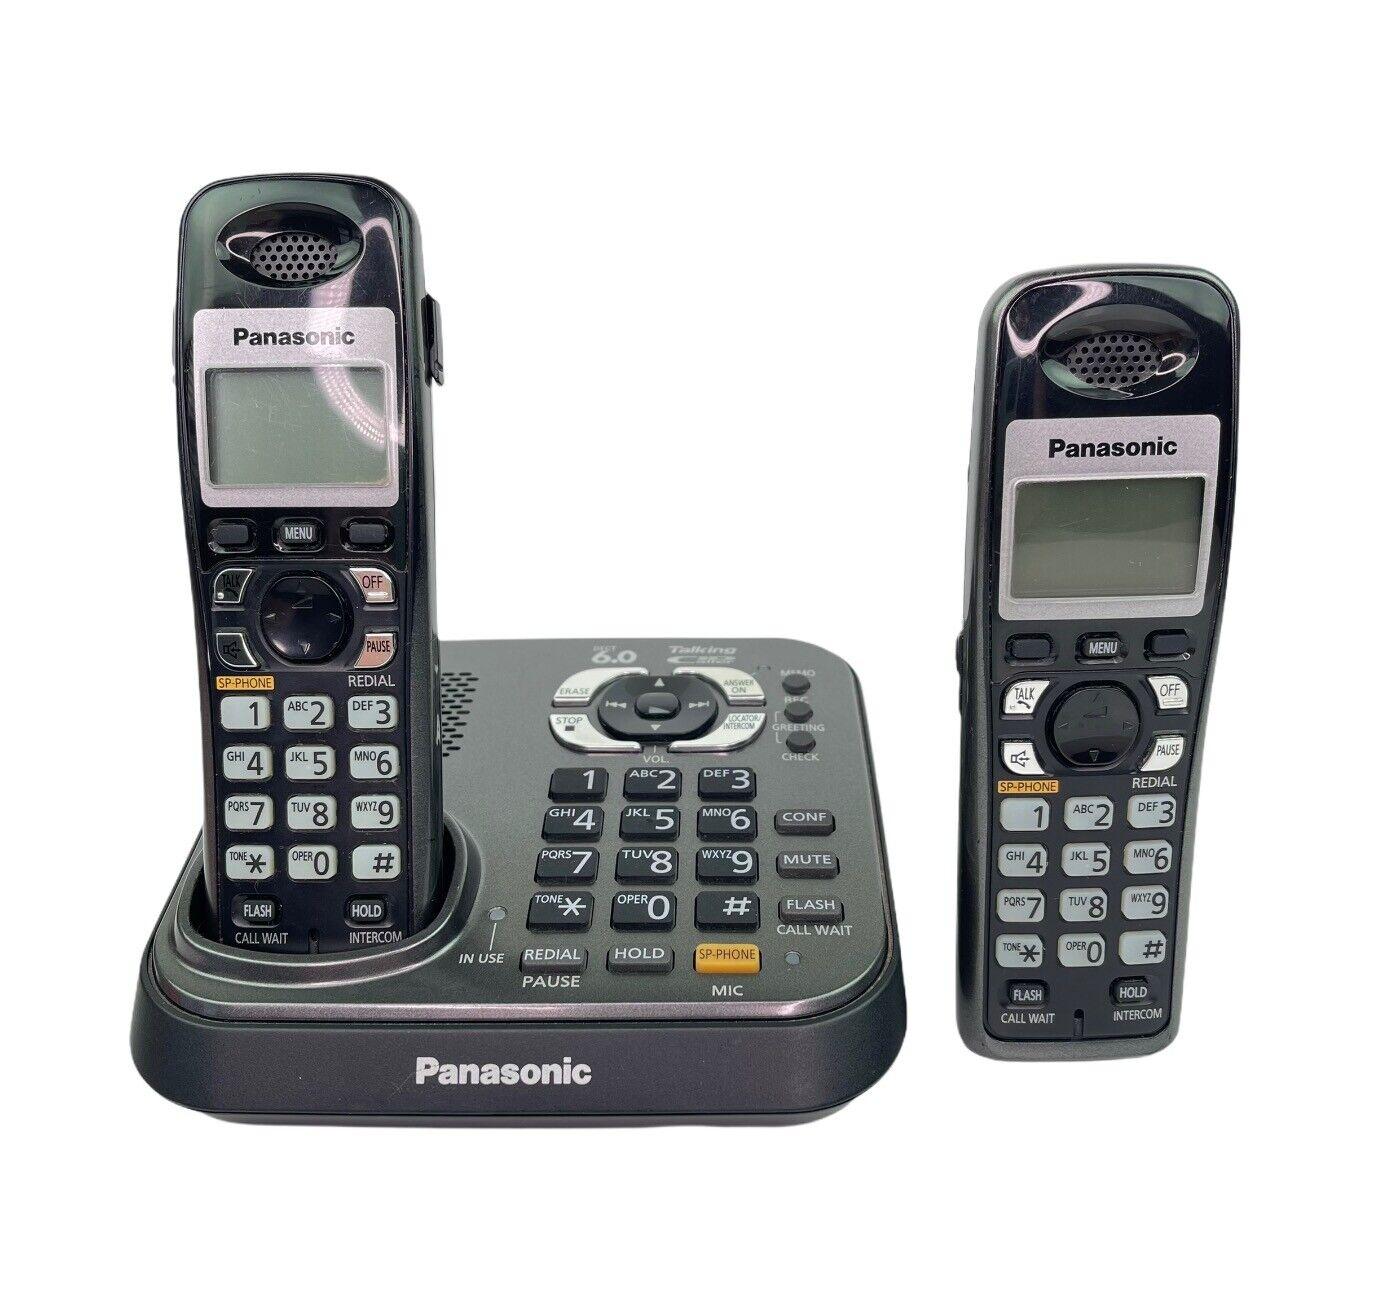 Panasonic KX-TG9341T Home Phone System Handset Answering Mac